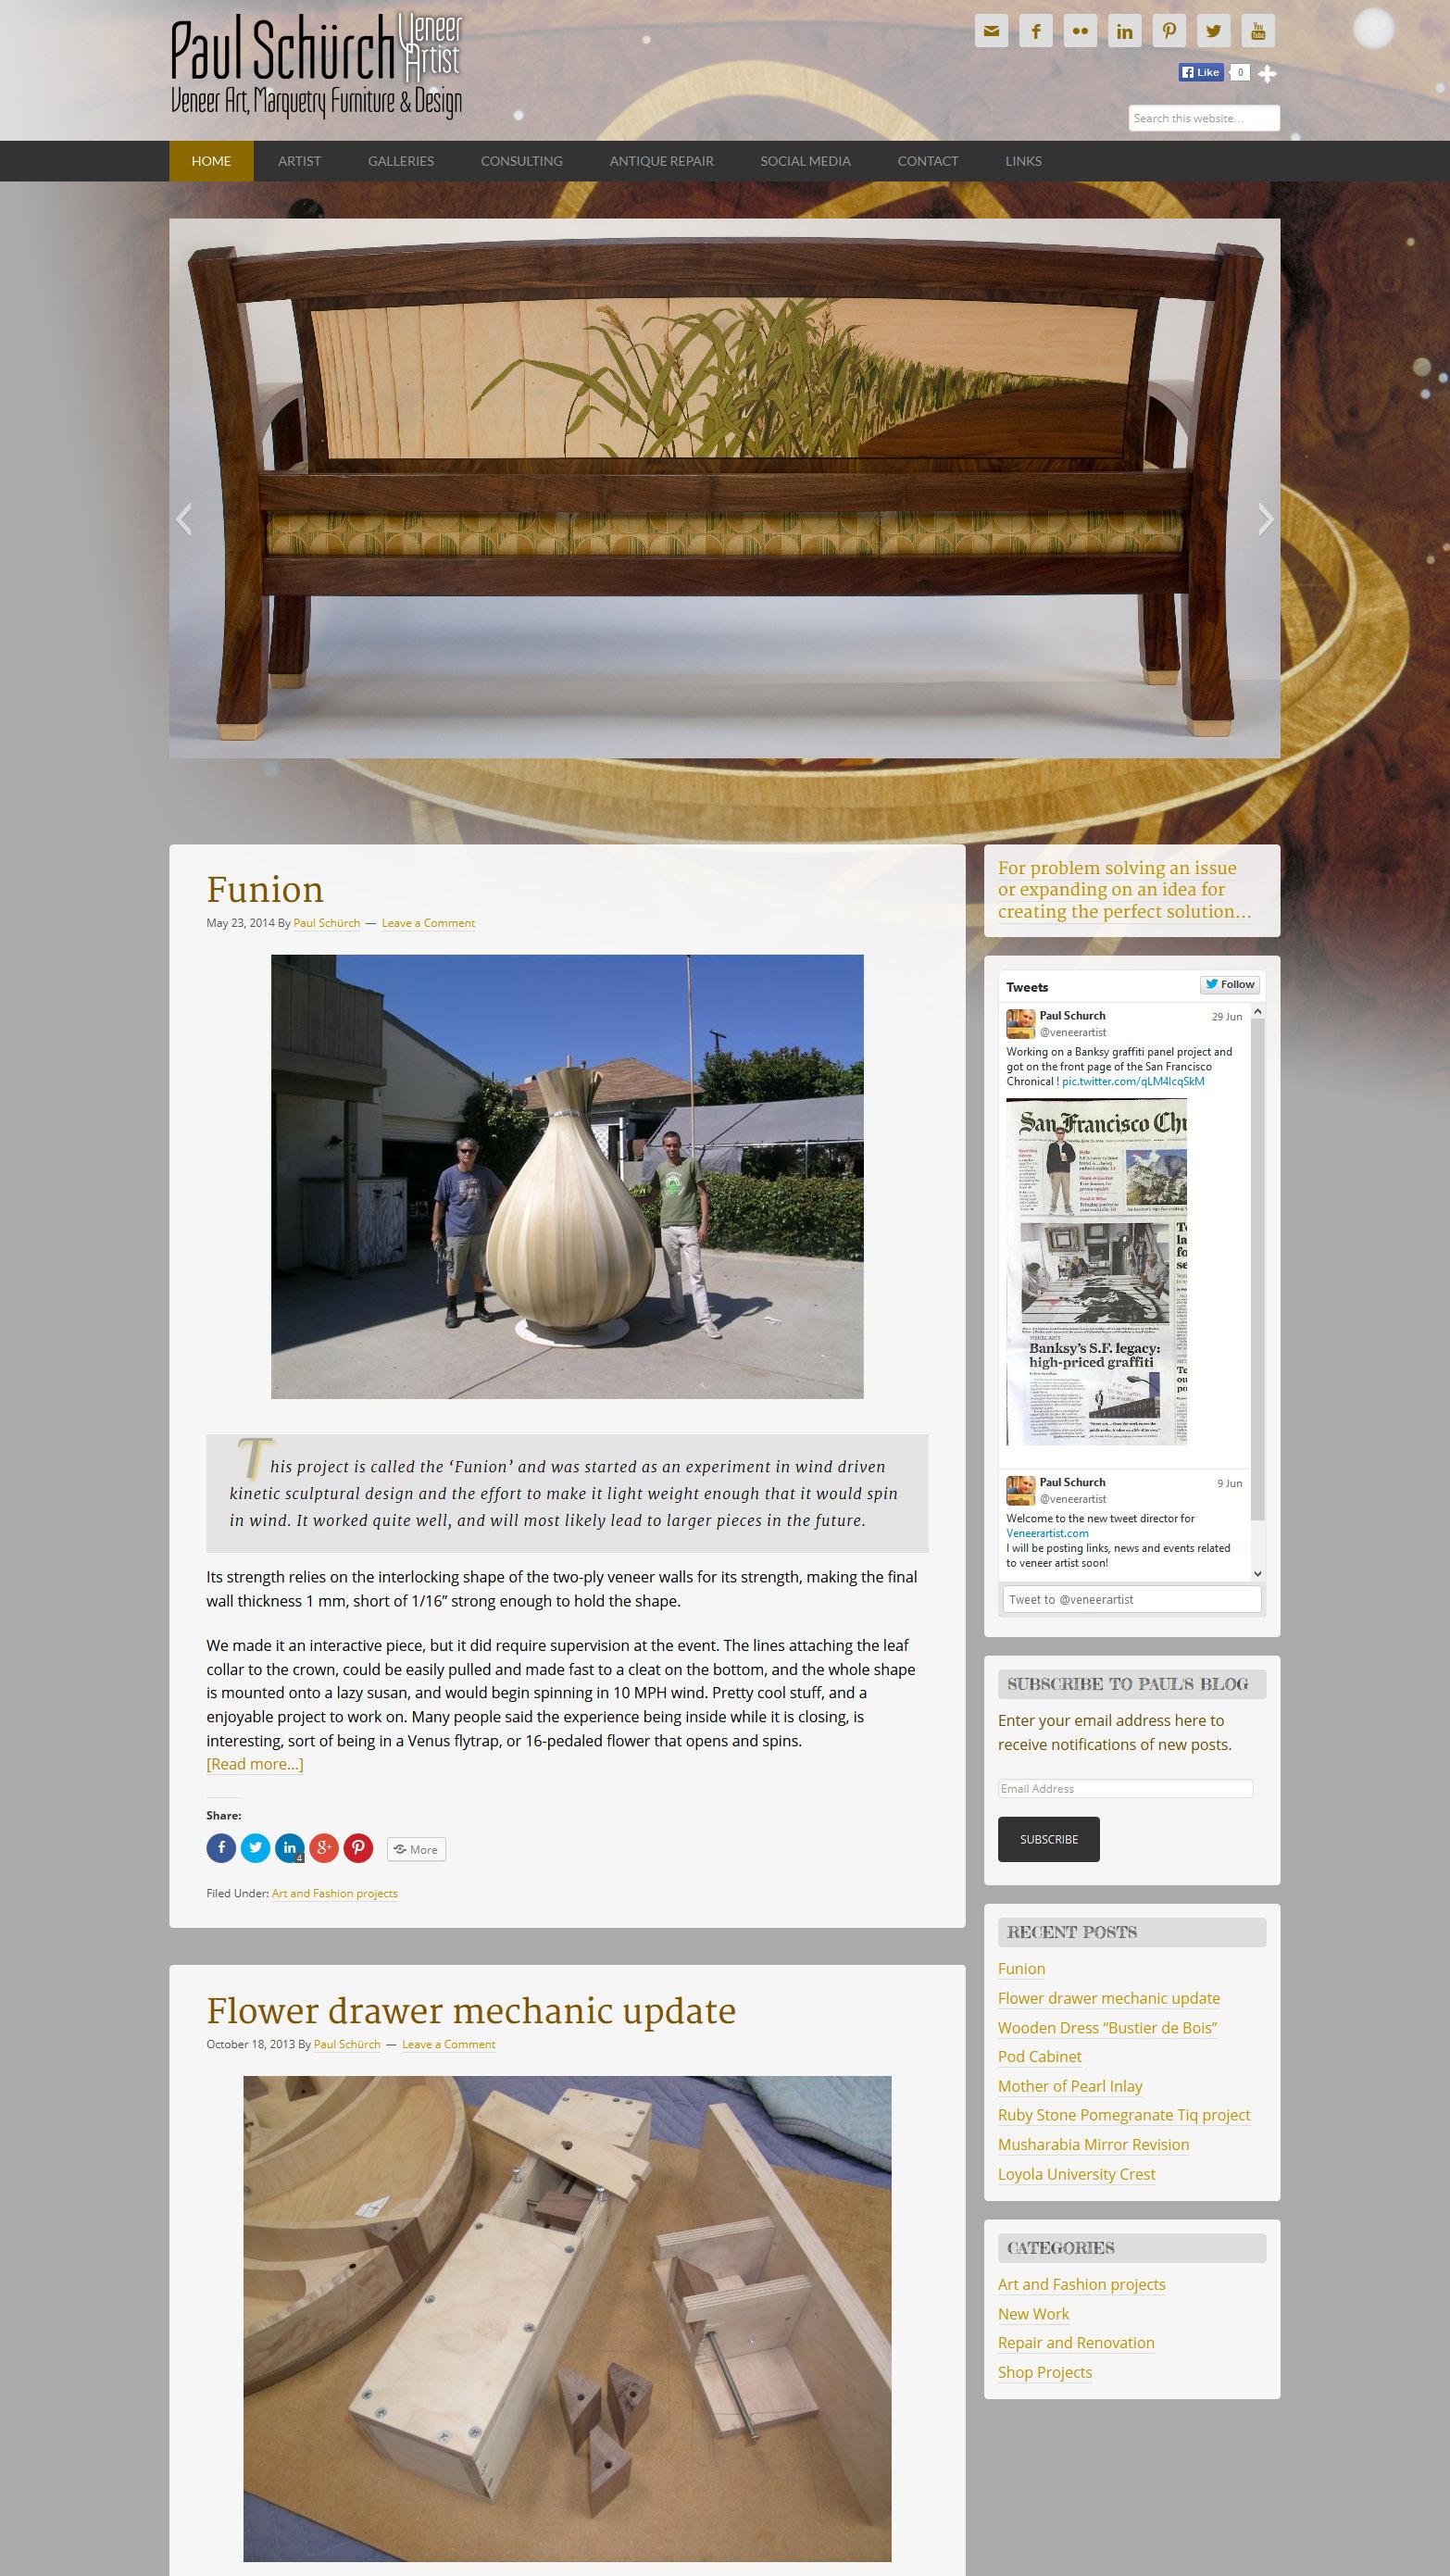 VeneerArtist.com Web Design and Implementation